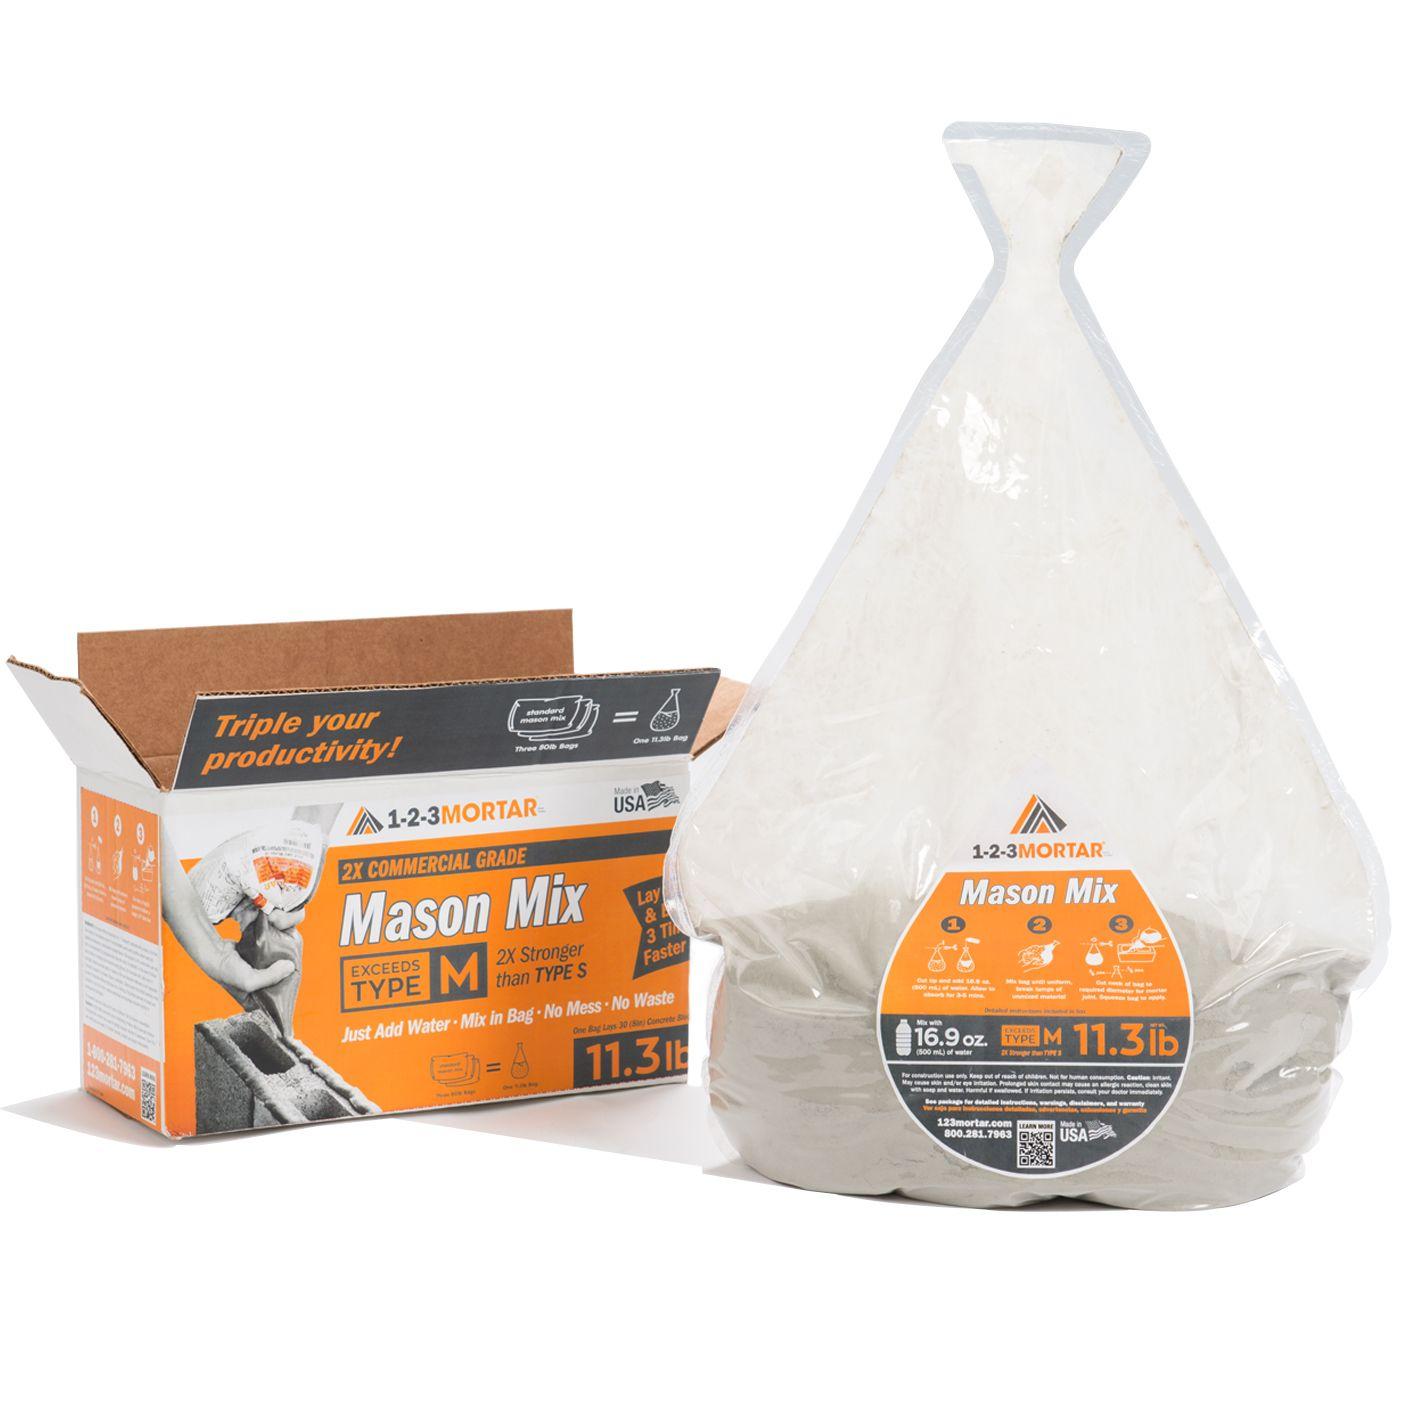 Type M Mortar Mason Mix Ready To Use Just Add Water Mortar Mason Grade